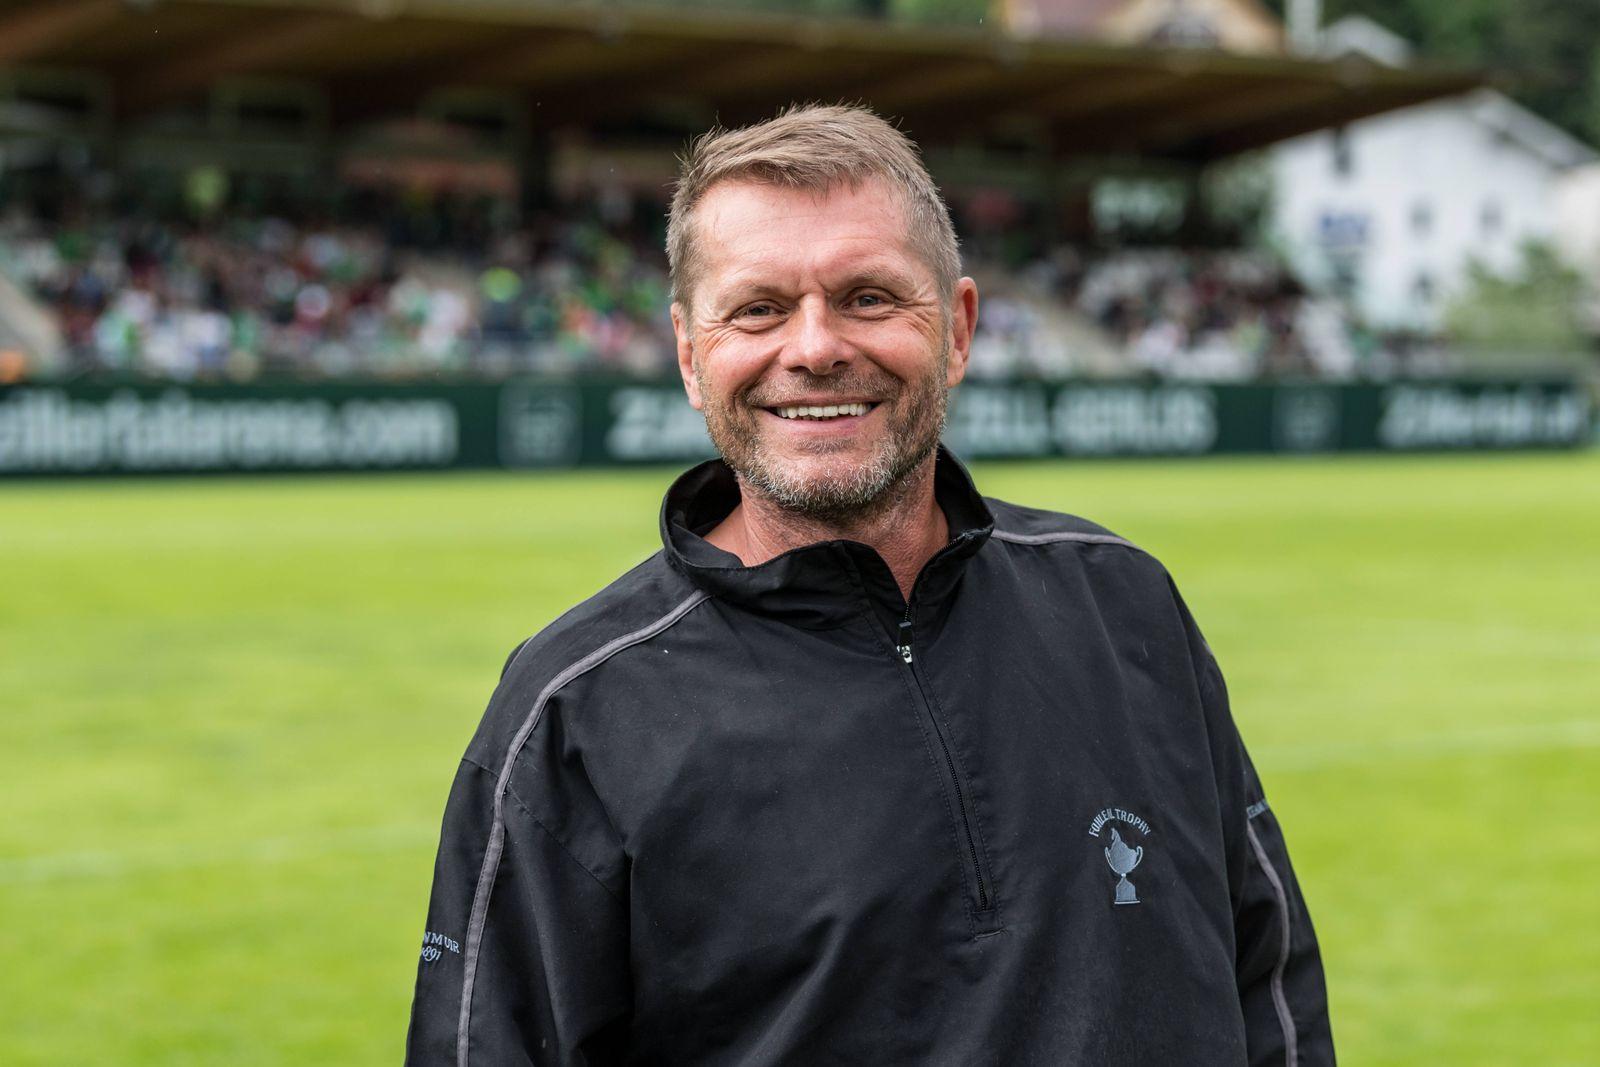 Fussball Trashtalk - Ulrich Uli Borowka